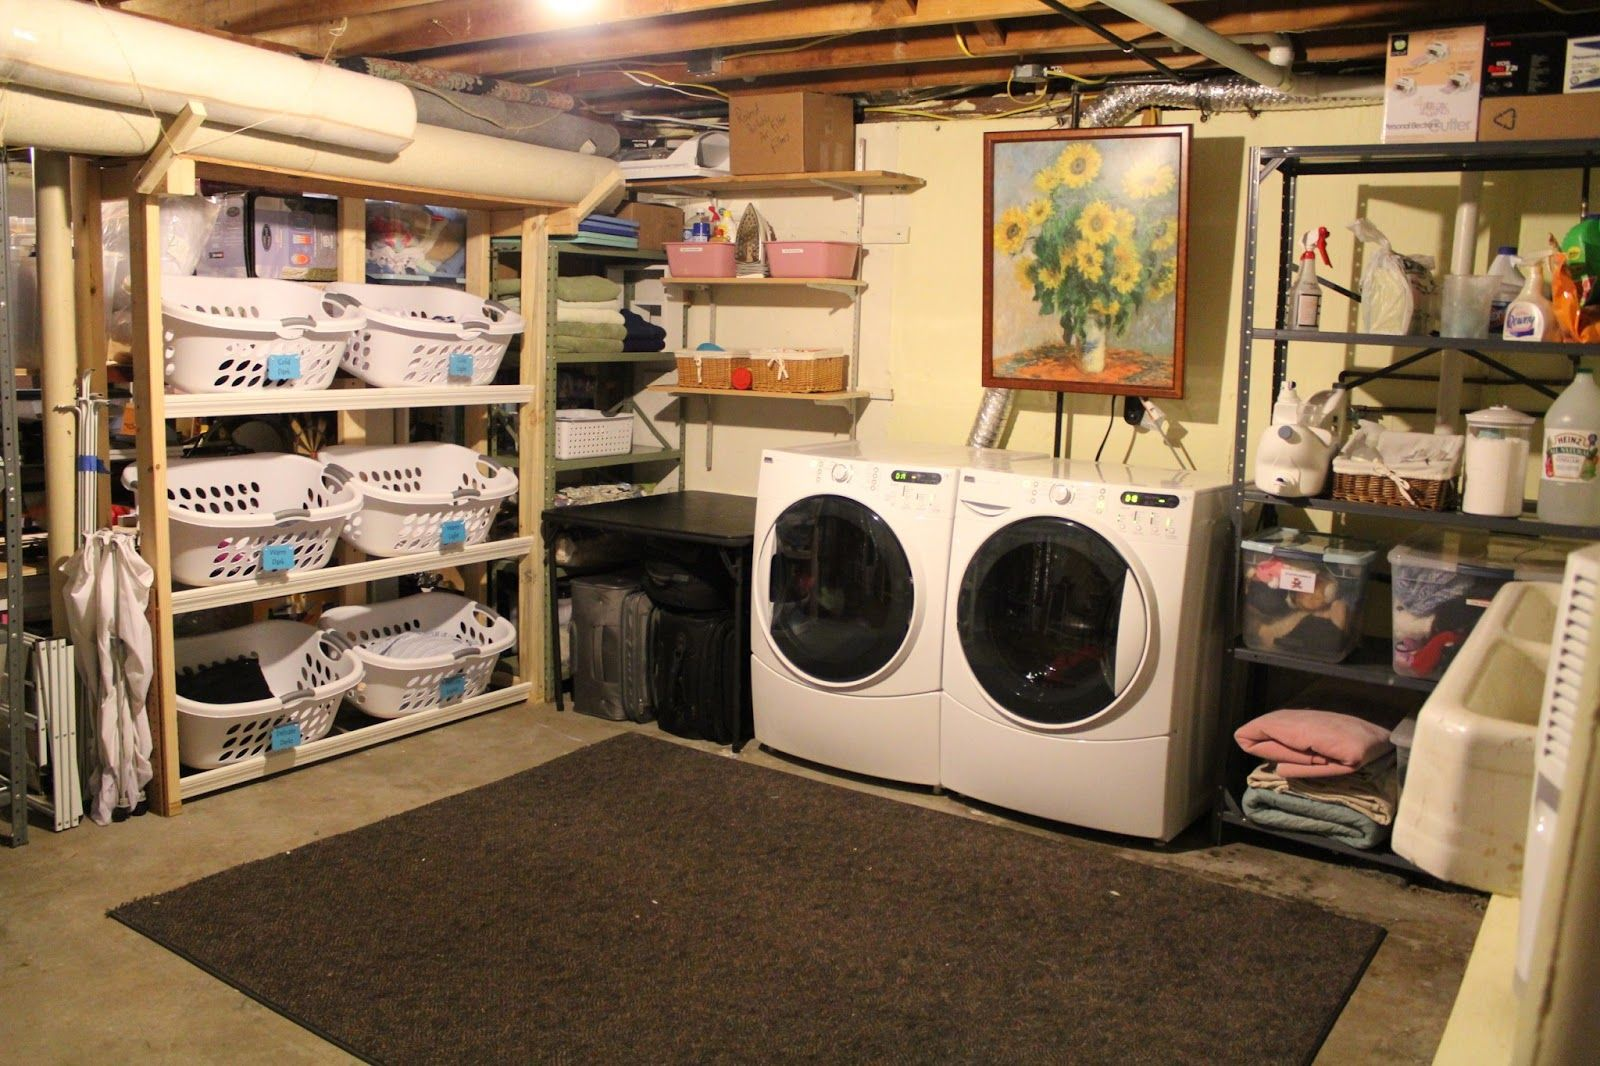 Basement Laundry Room Makeover Ideas Decor 21 best basement laundry room design ideas for you | basement